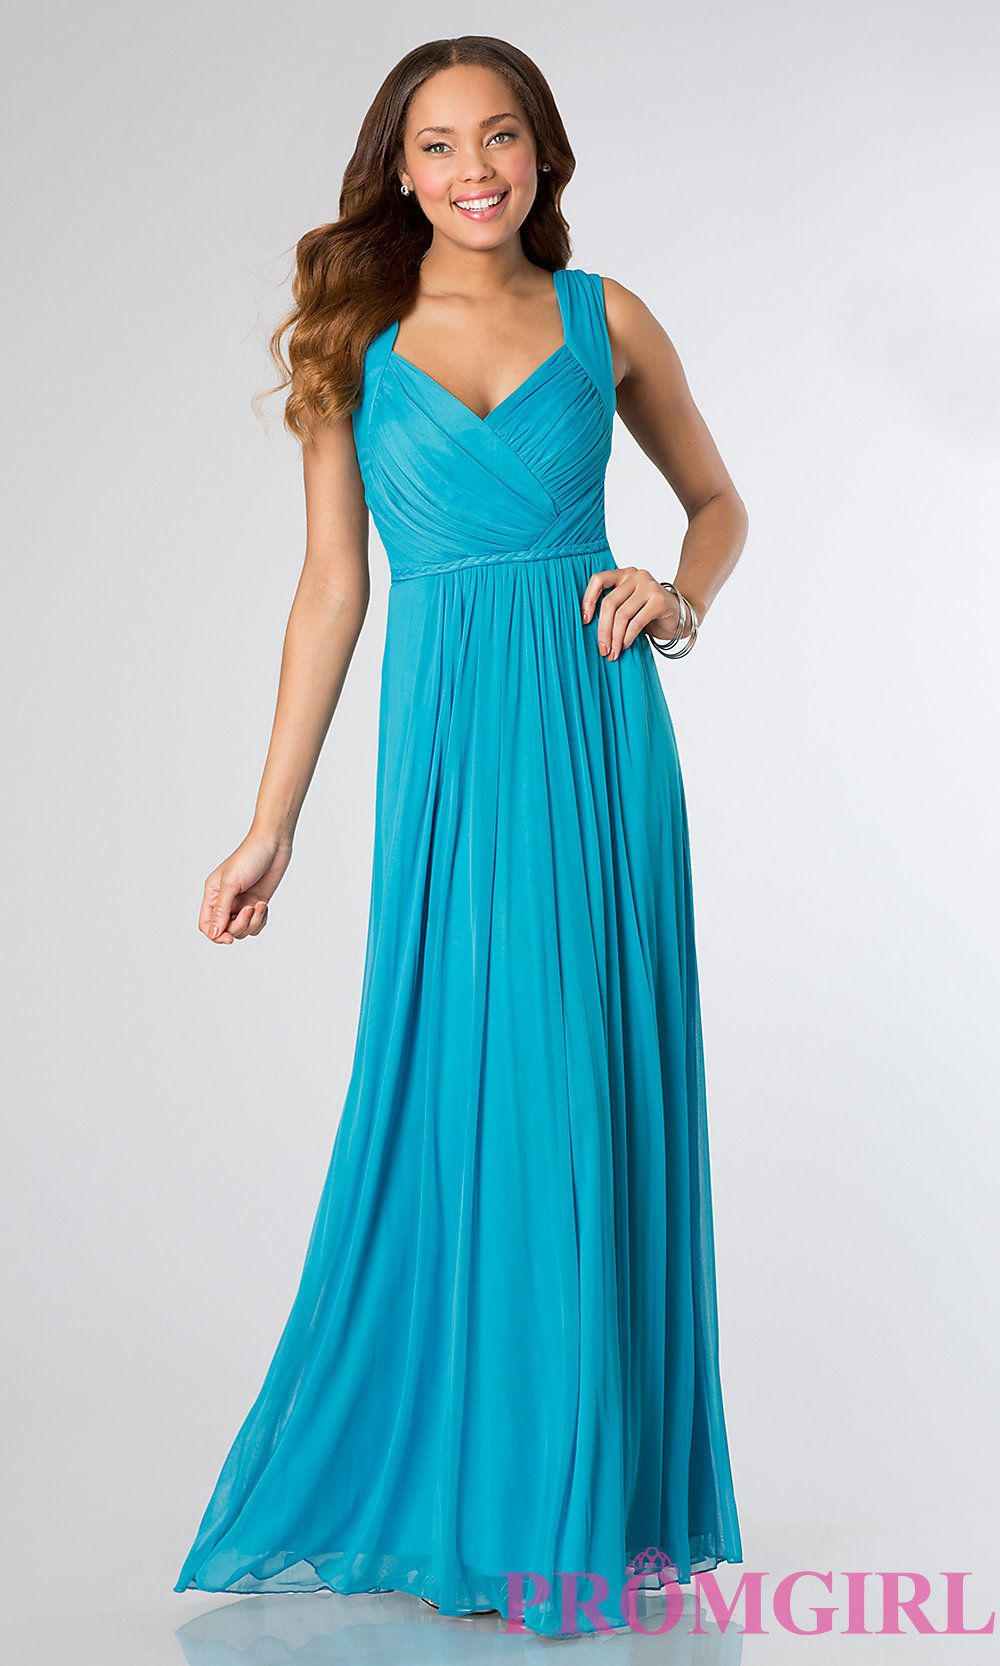 Long Prom Dress Front Image | Fashion | Pinterest | Long prom ...